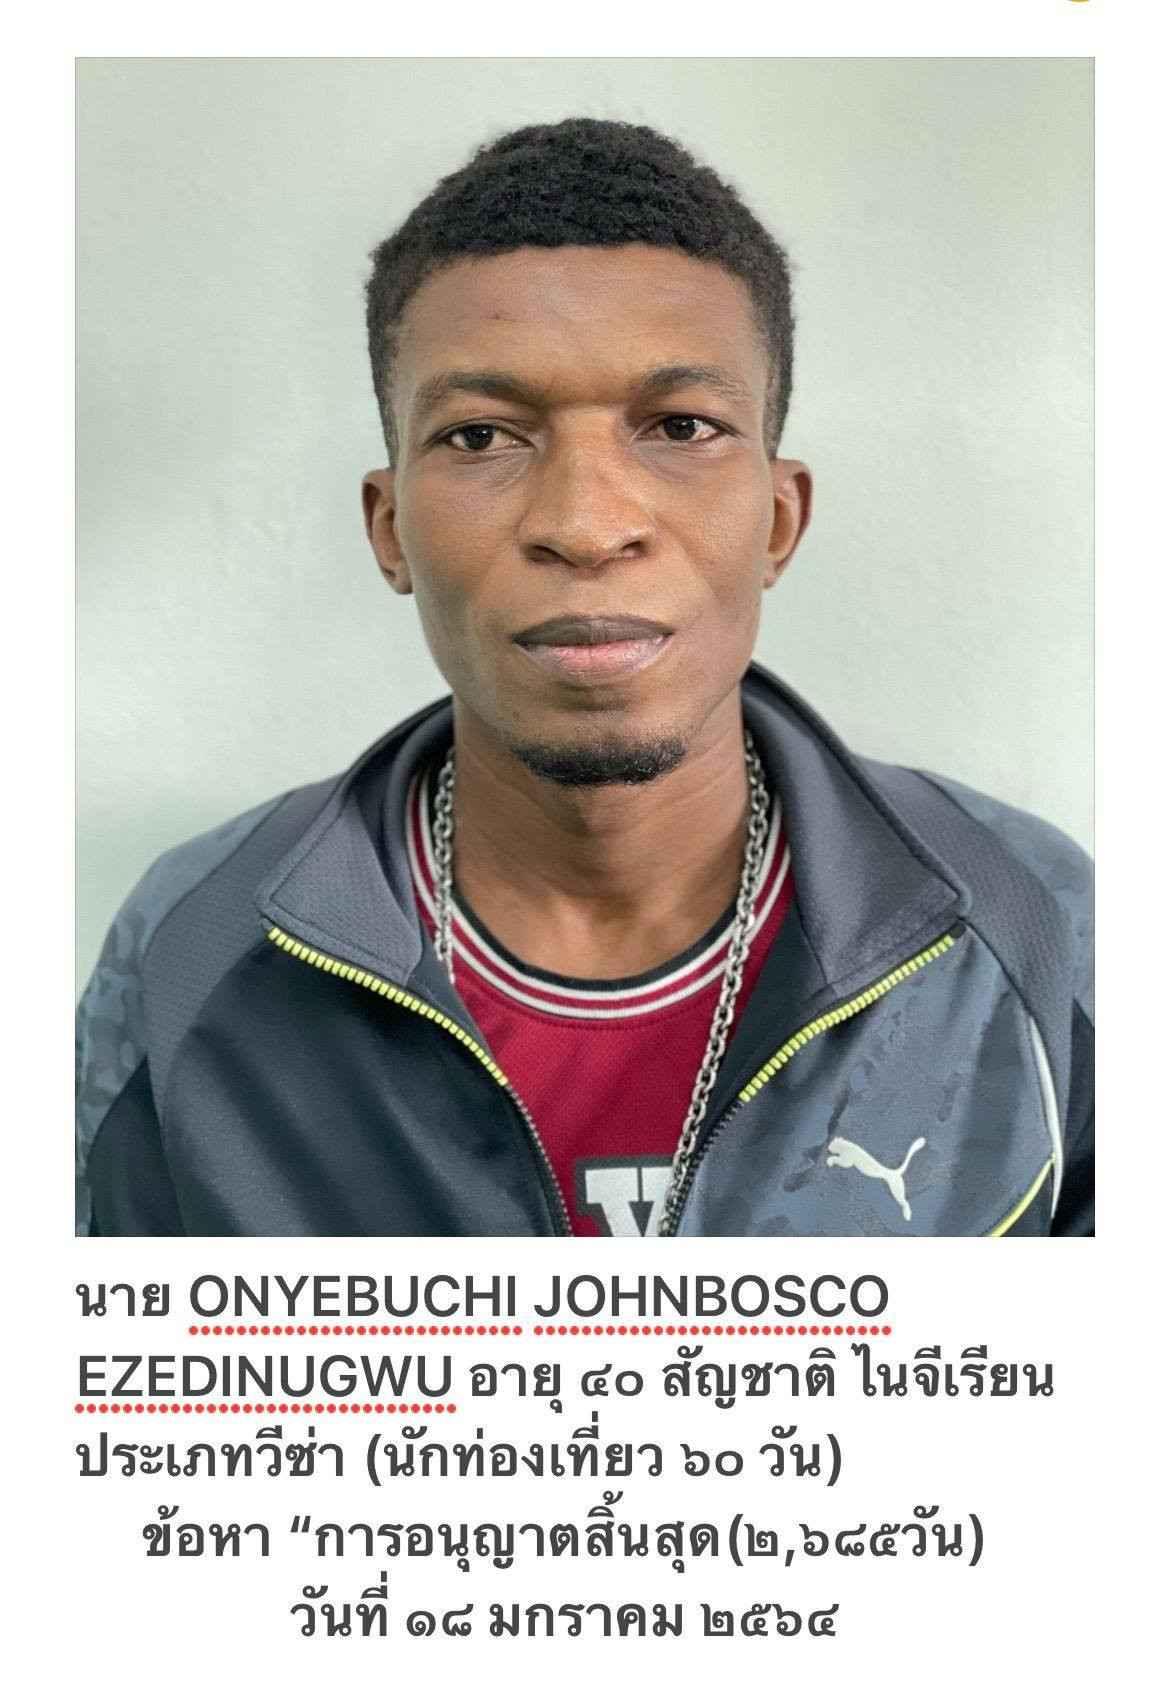 <img alt='.' class='lazyload' data-src='https://img.gistmania.com/emot/photo.png' /><img alt='.' class='lazyload' data-src='https://img.gistmania.com/emot/shocked.gif' /> PHOTOS: <b>Nigerian Man, Onyebuchi Johnbosco Arrested In Thailand For Overstaying His Visa</b>